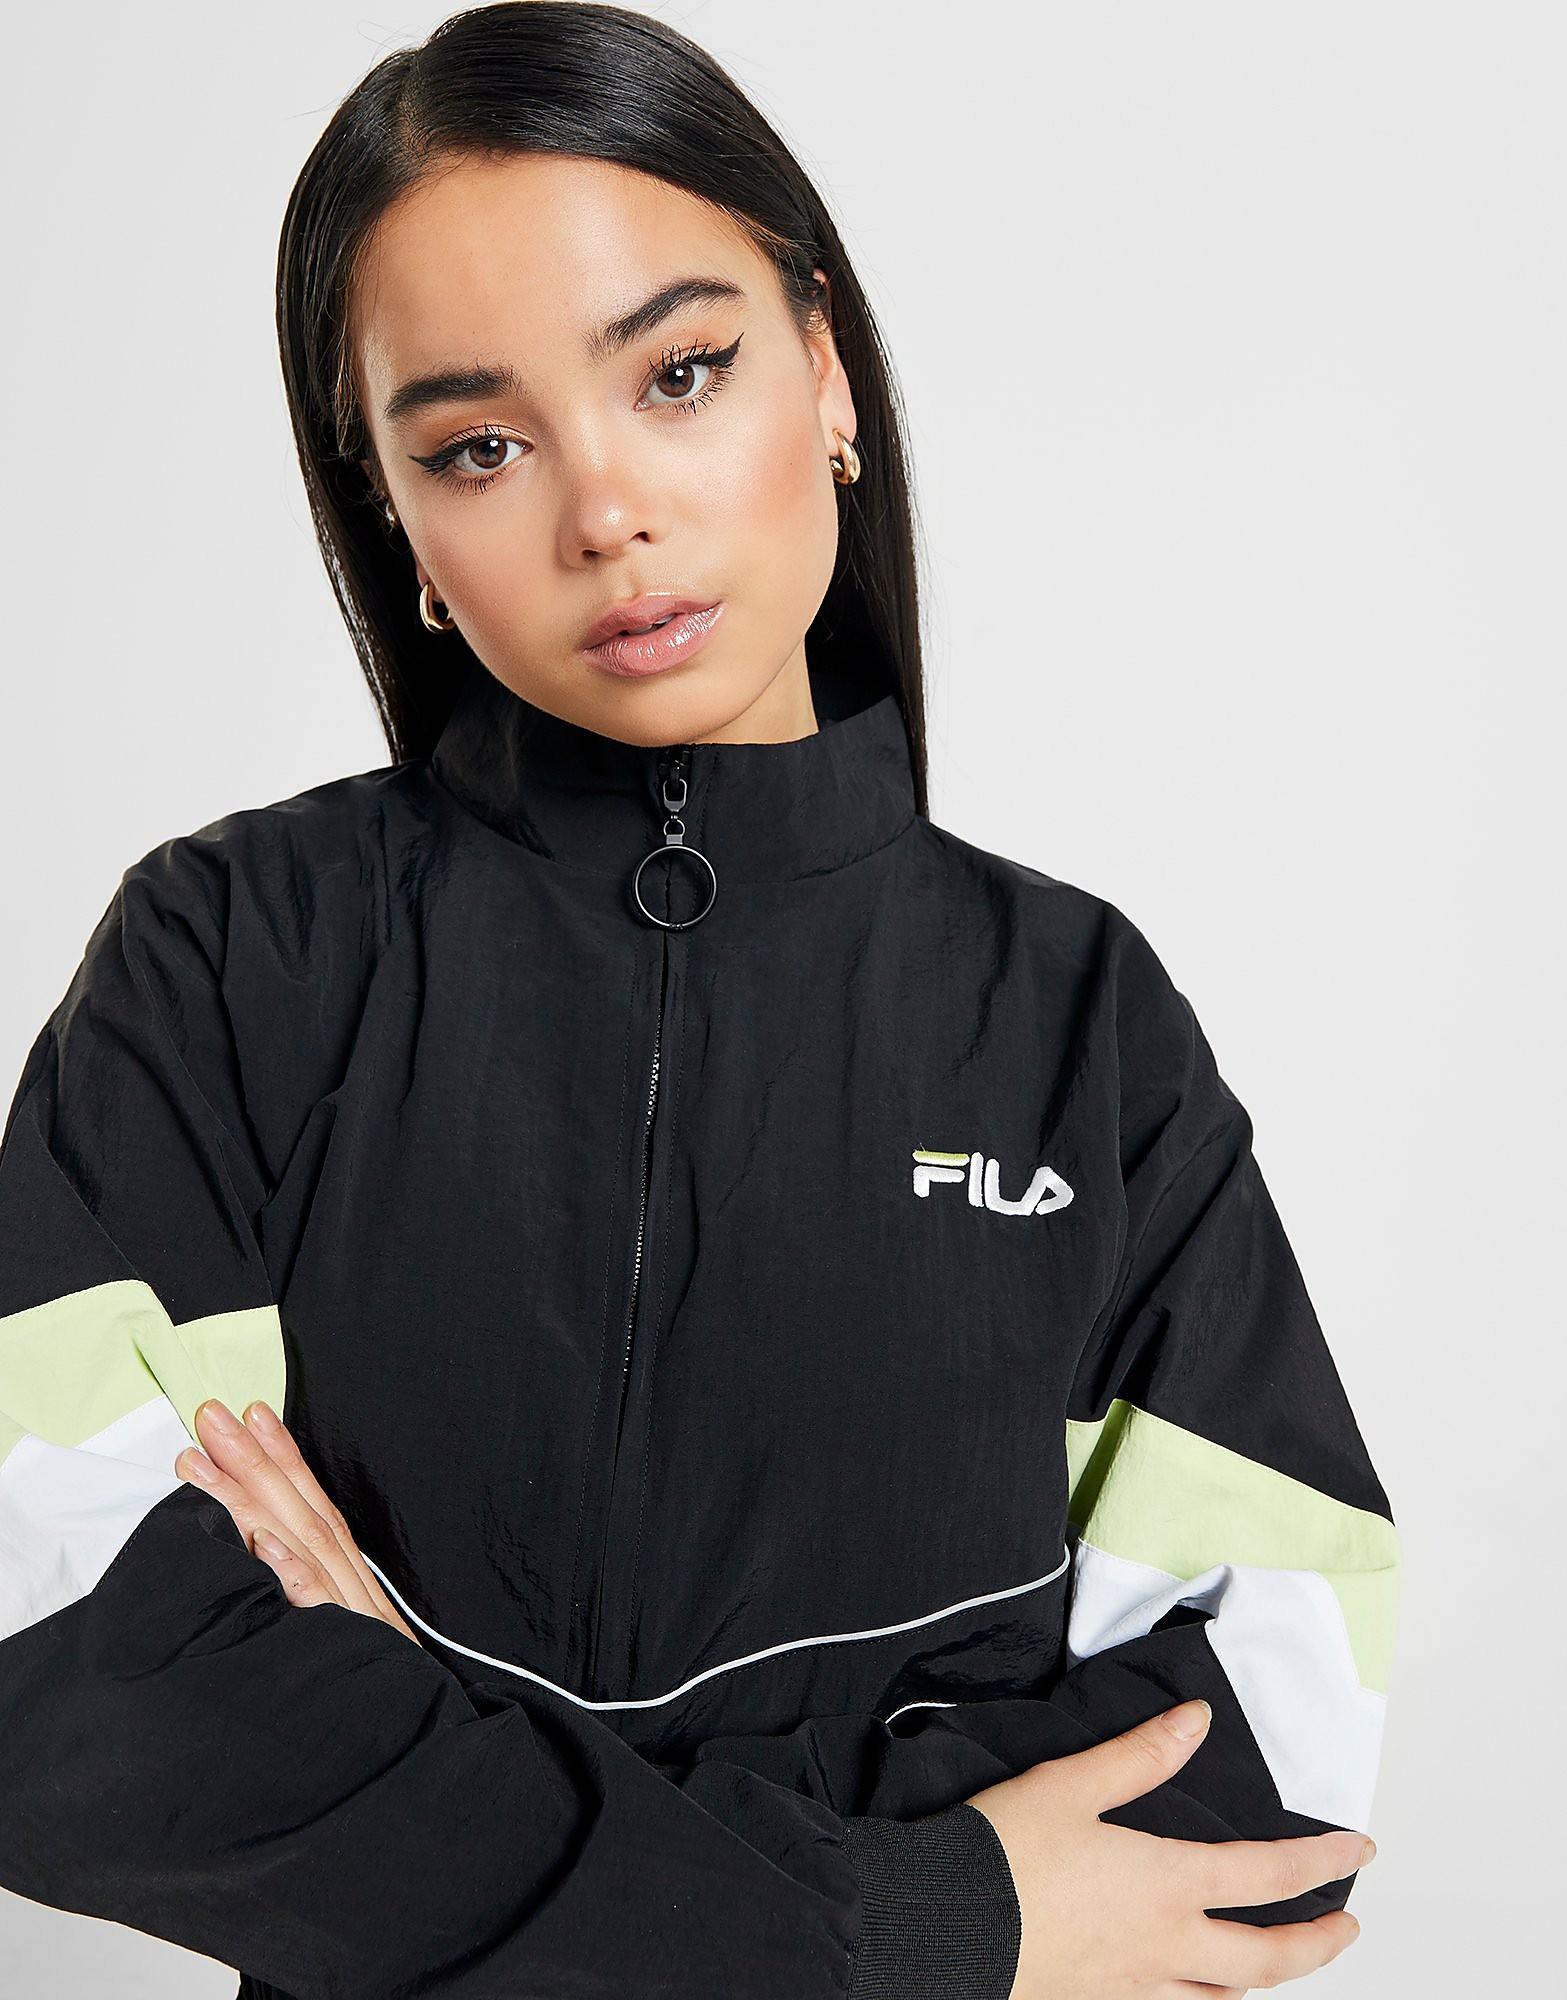 Fila Piping Woven 14 Zip Jacket